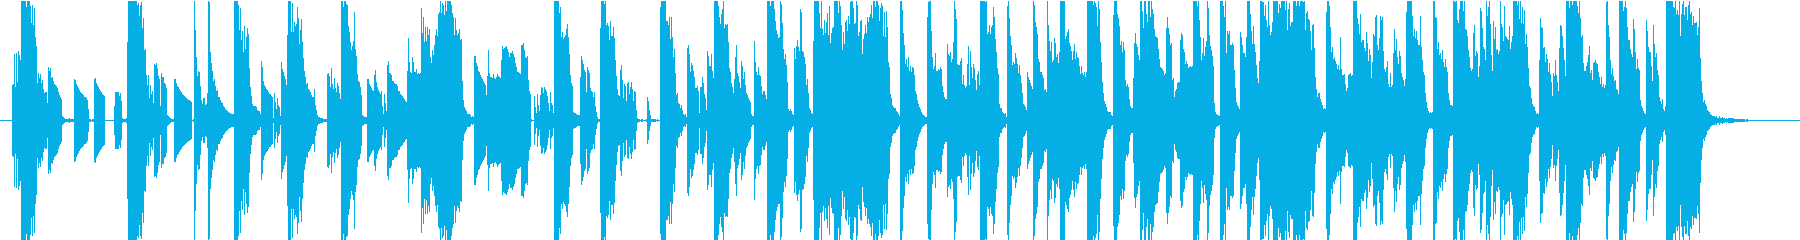 POPな電子音・可愛いジングル_2の再生済みの波形